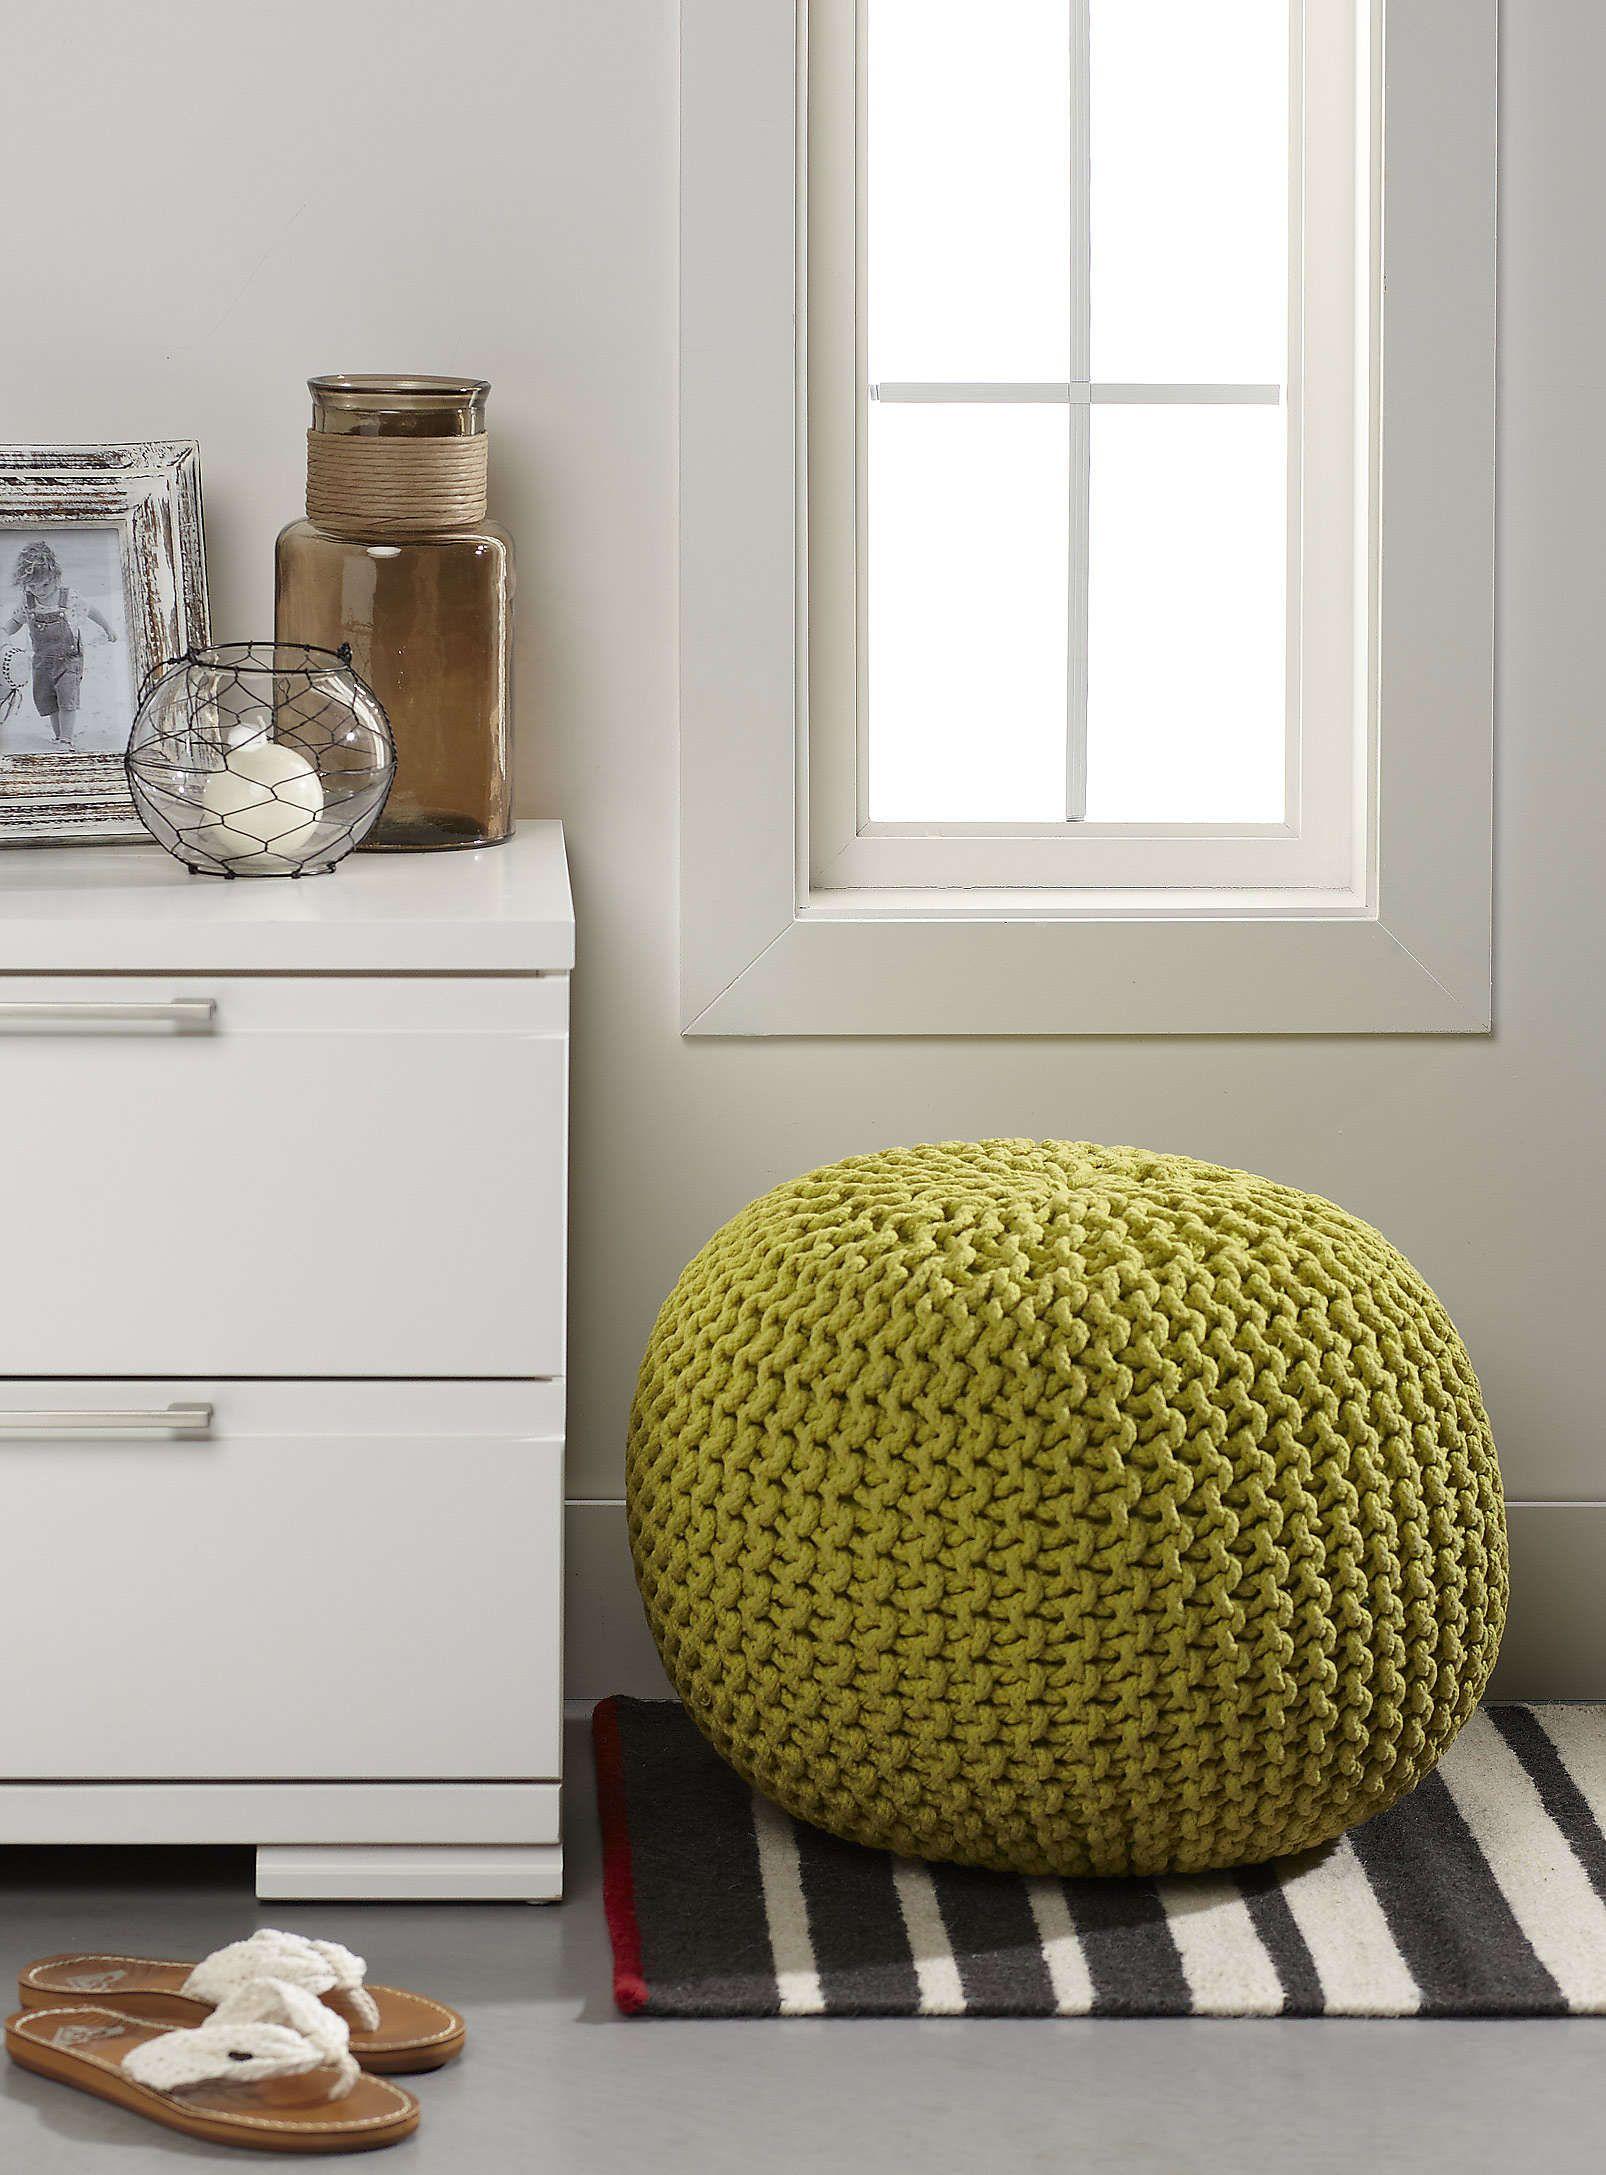 simons chair cupboard kvadrat raf kvadratraf cushion about small with lady masai furniture